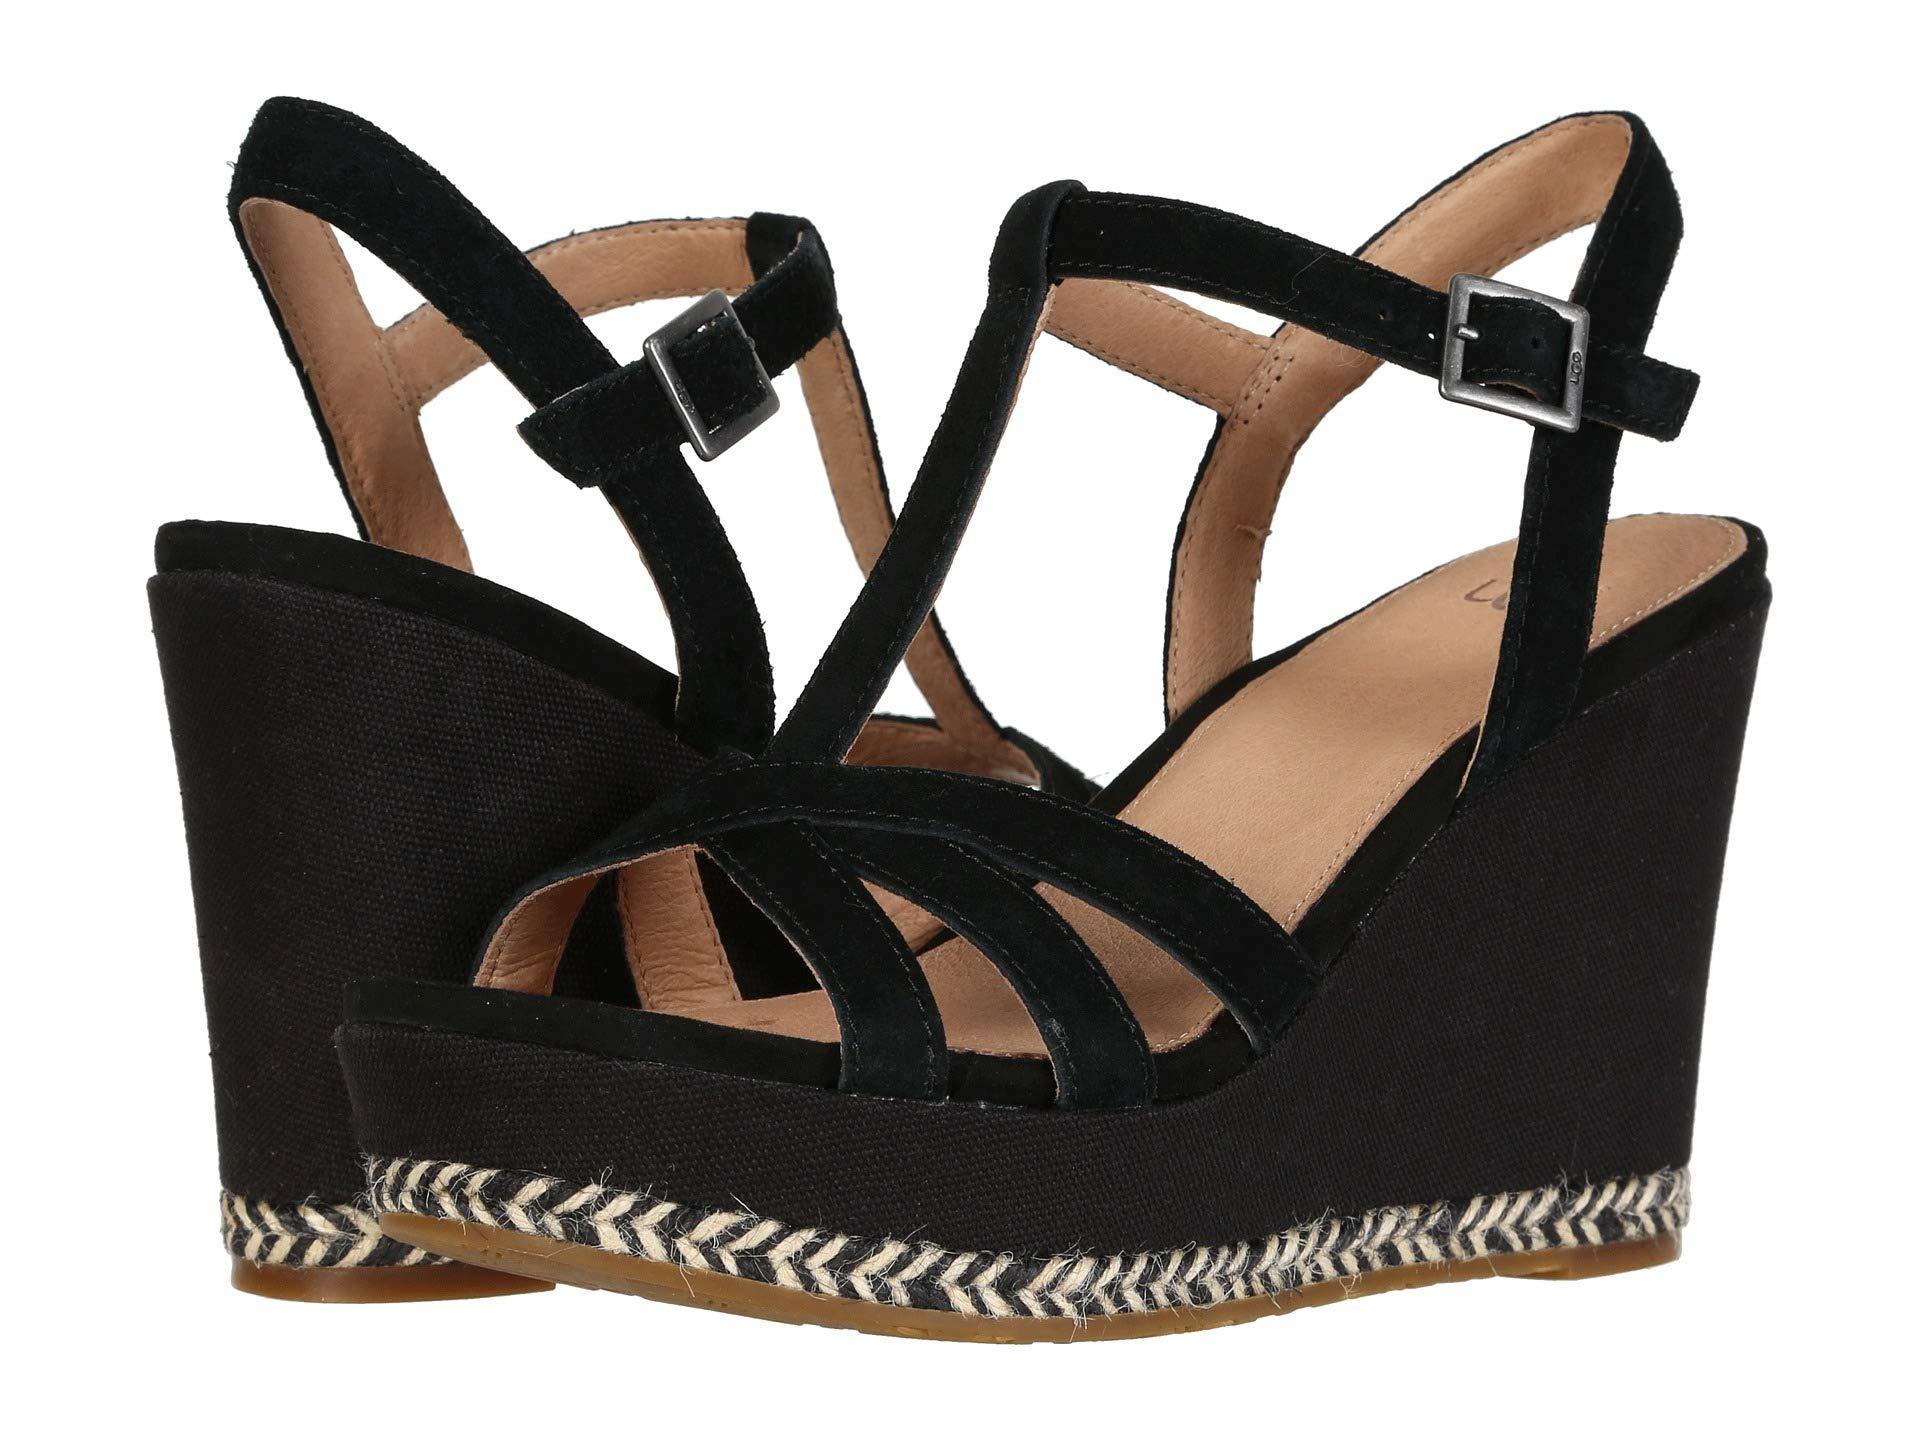 7352c3c3225 Lyst - UGG Melissa (black) Women s Sandals in Black